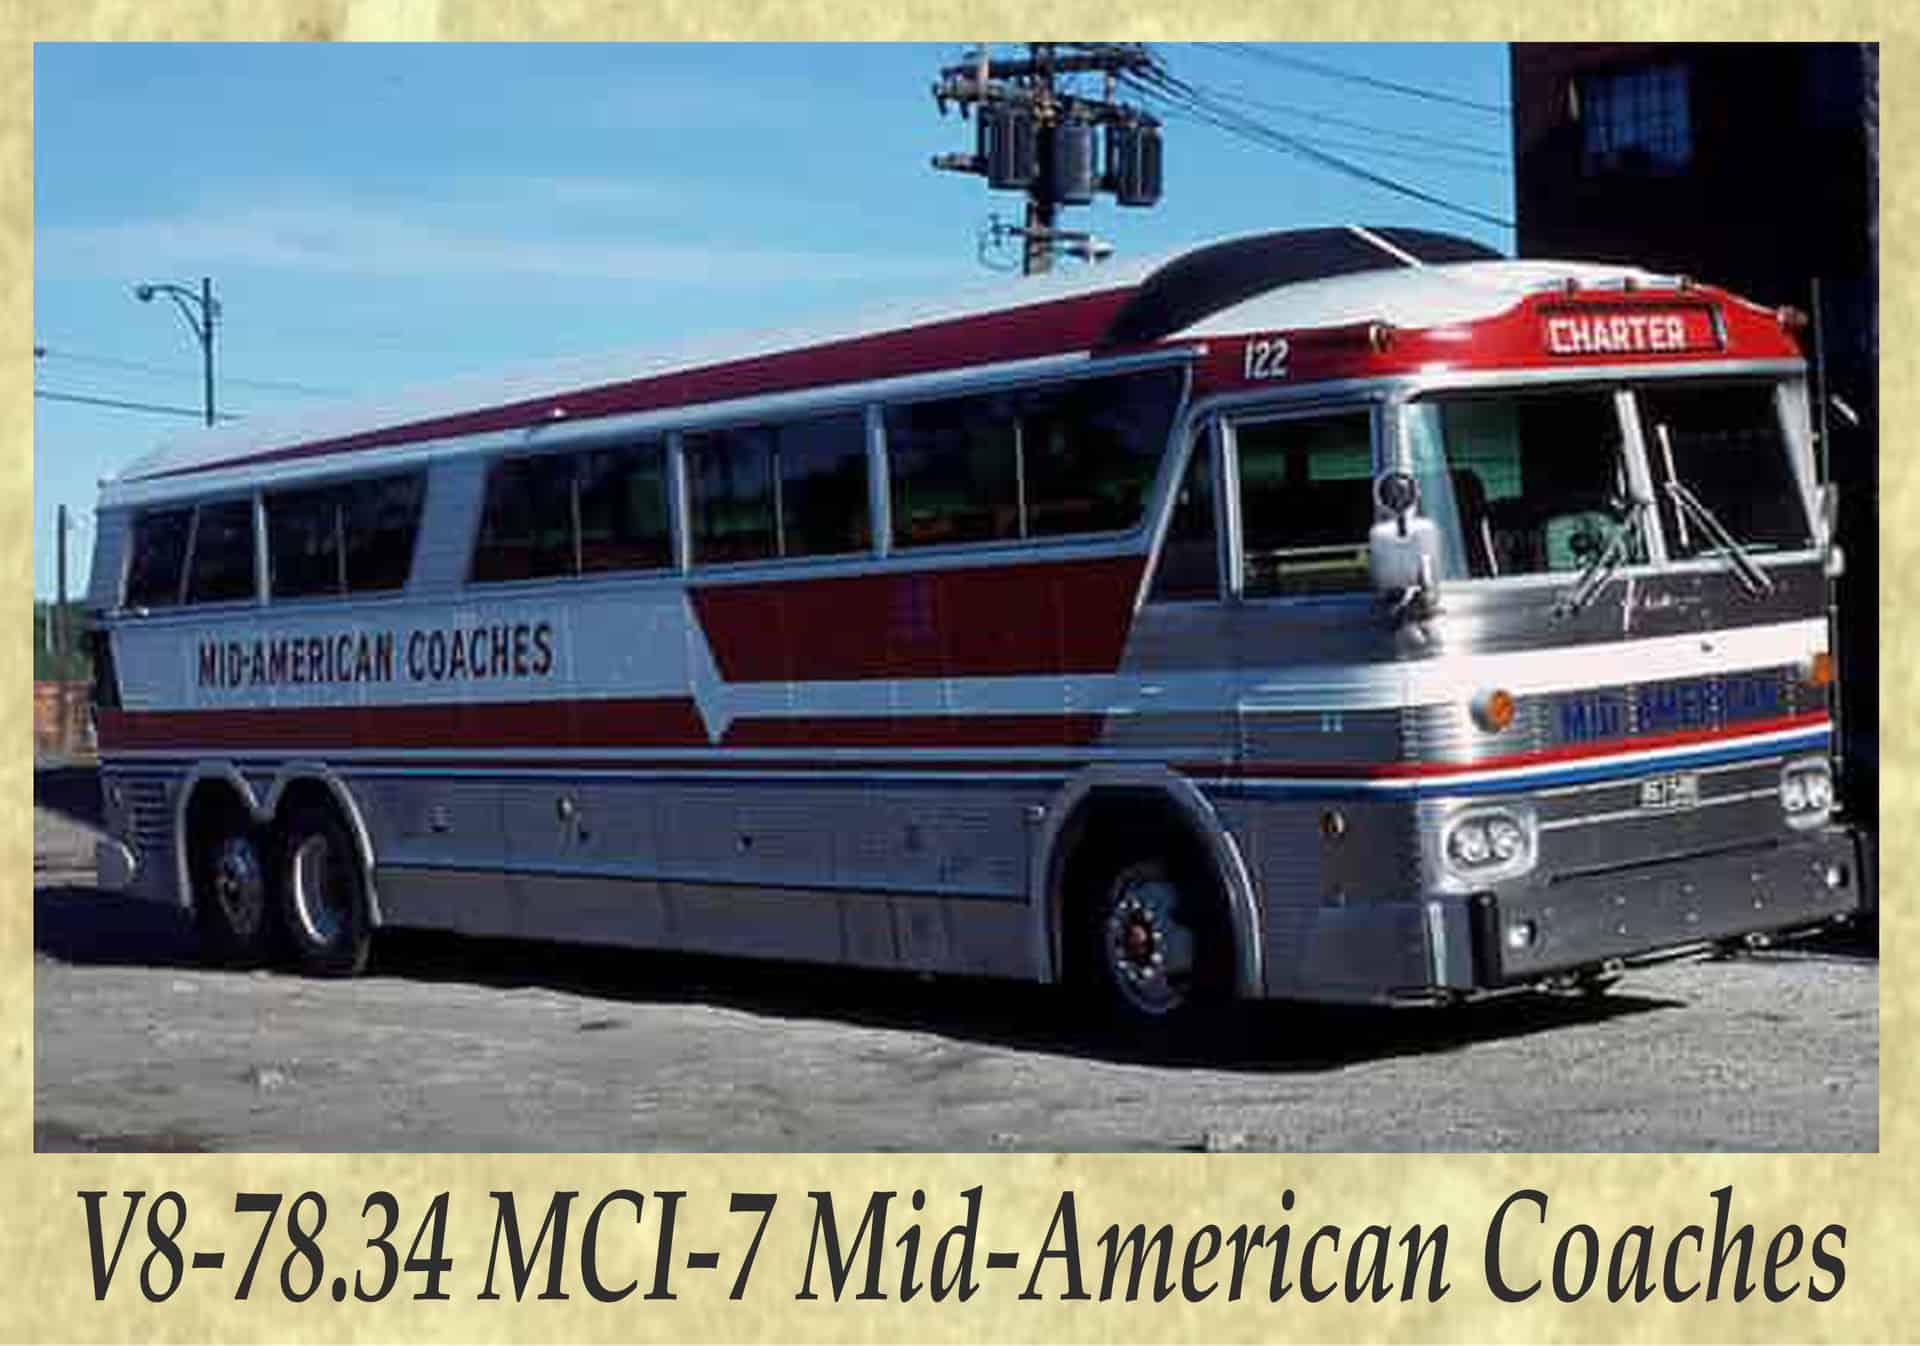 V8-78.34 MCI-7 Mid-American Coaches